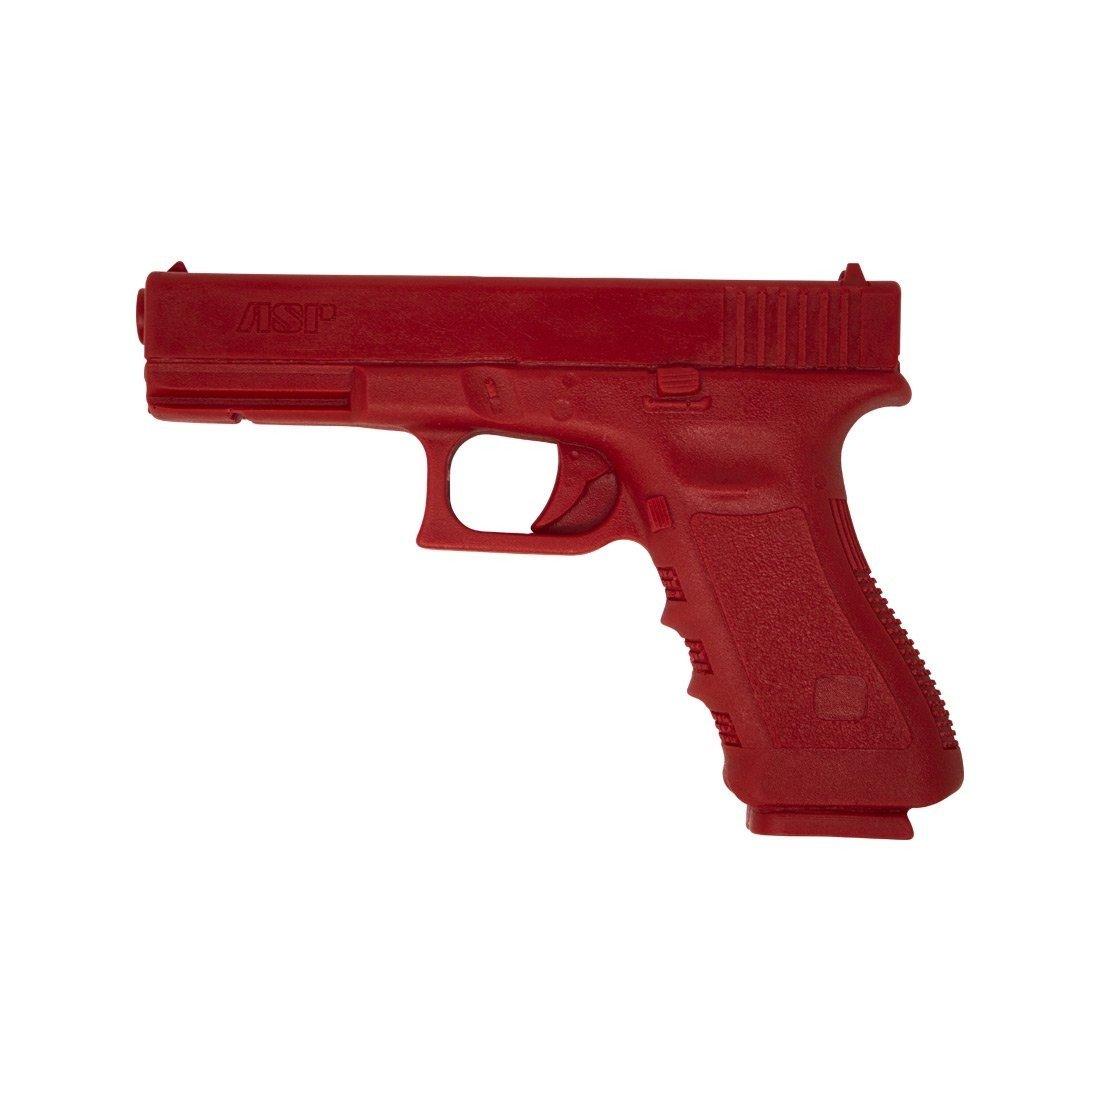 RED GUN GLOCK 17